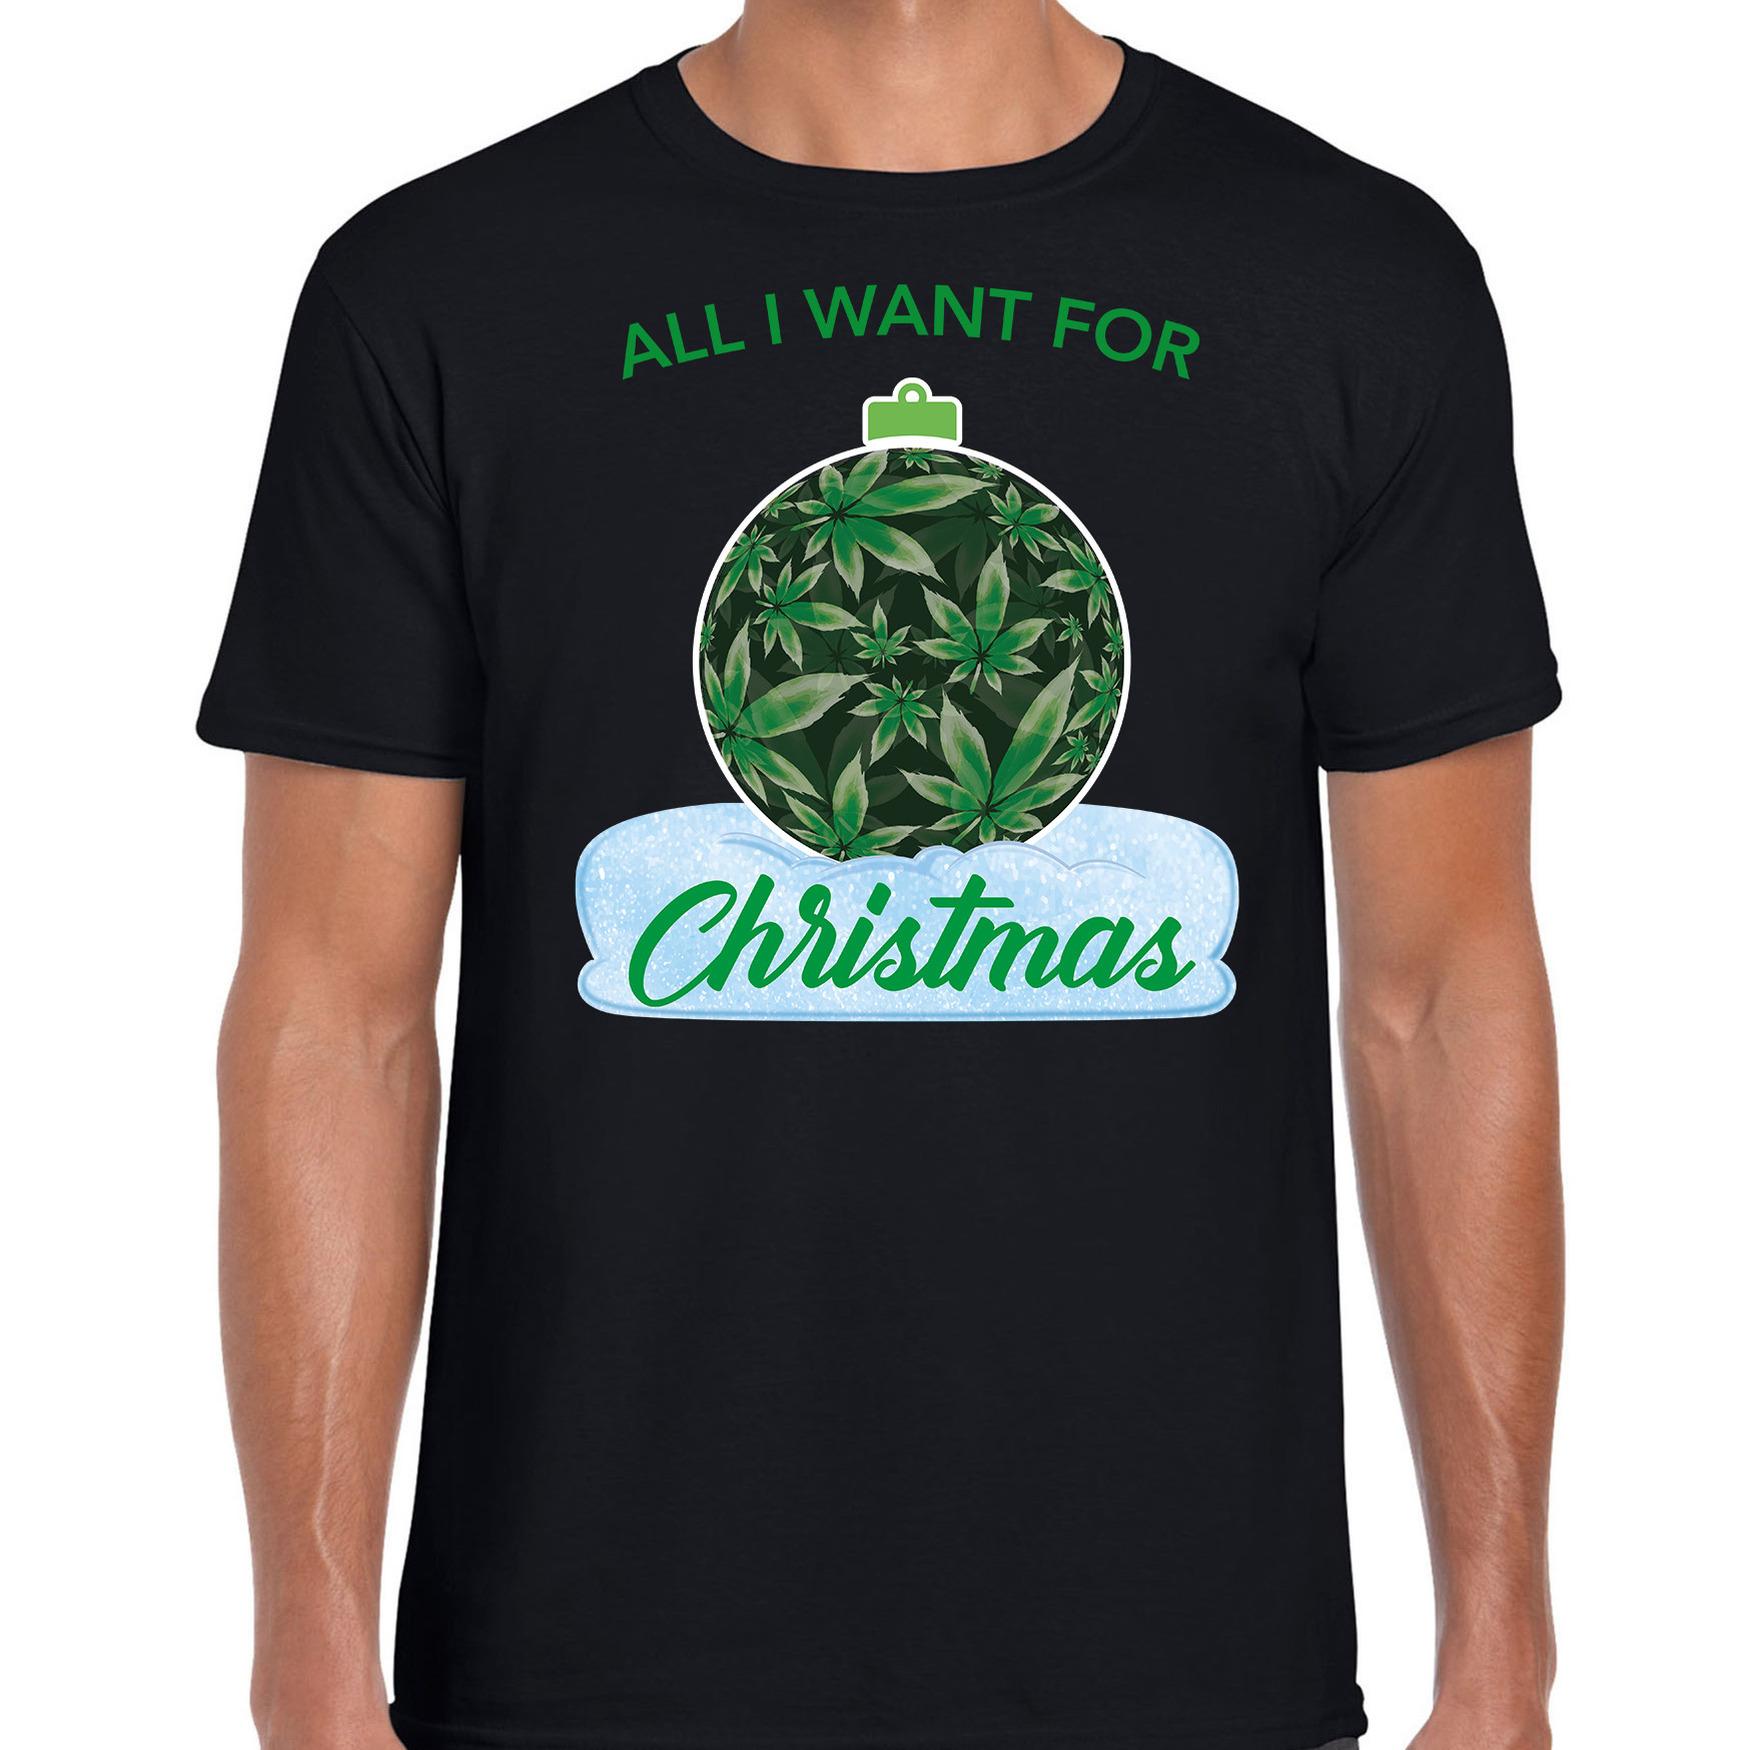 Wiet kerstbal shirt kerst t-shirt all i want for christmas zwart voor heren